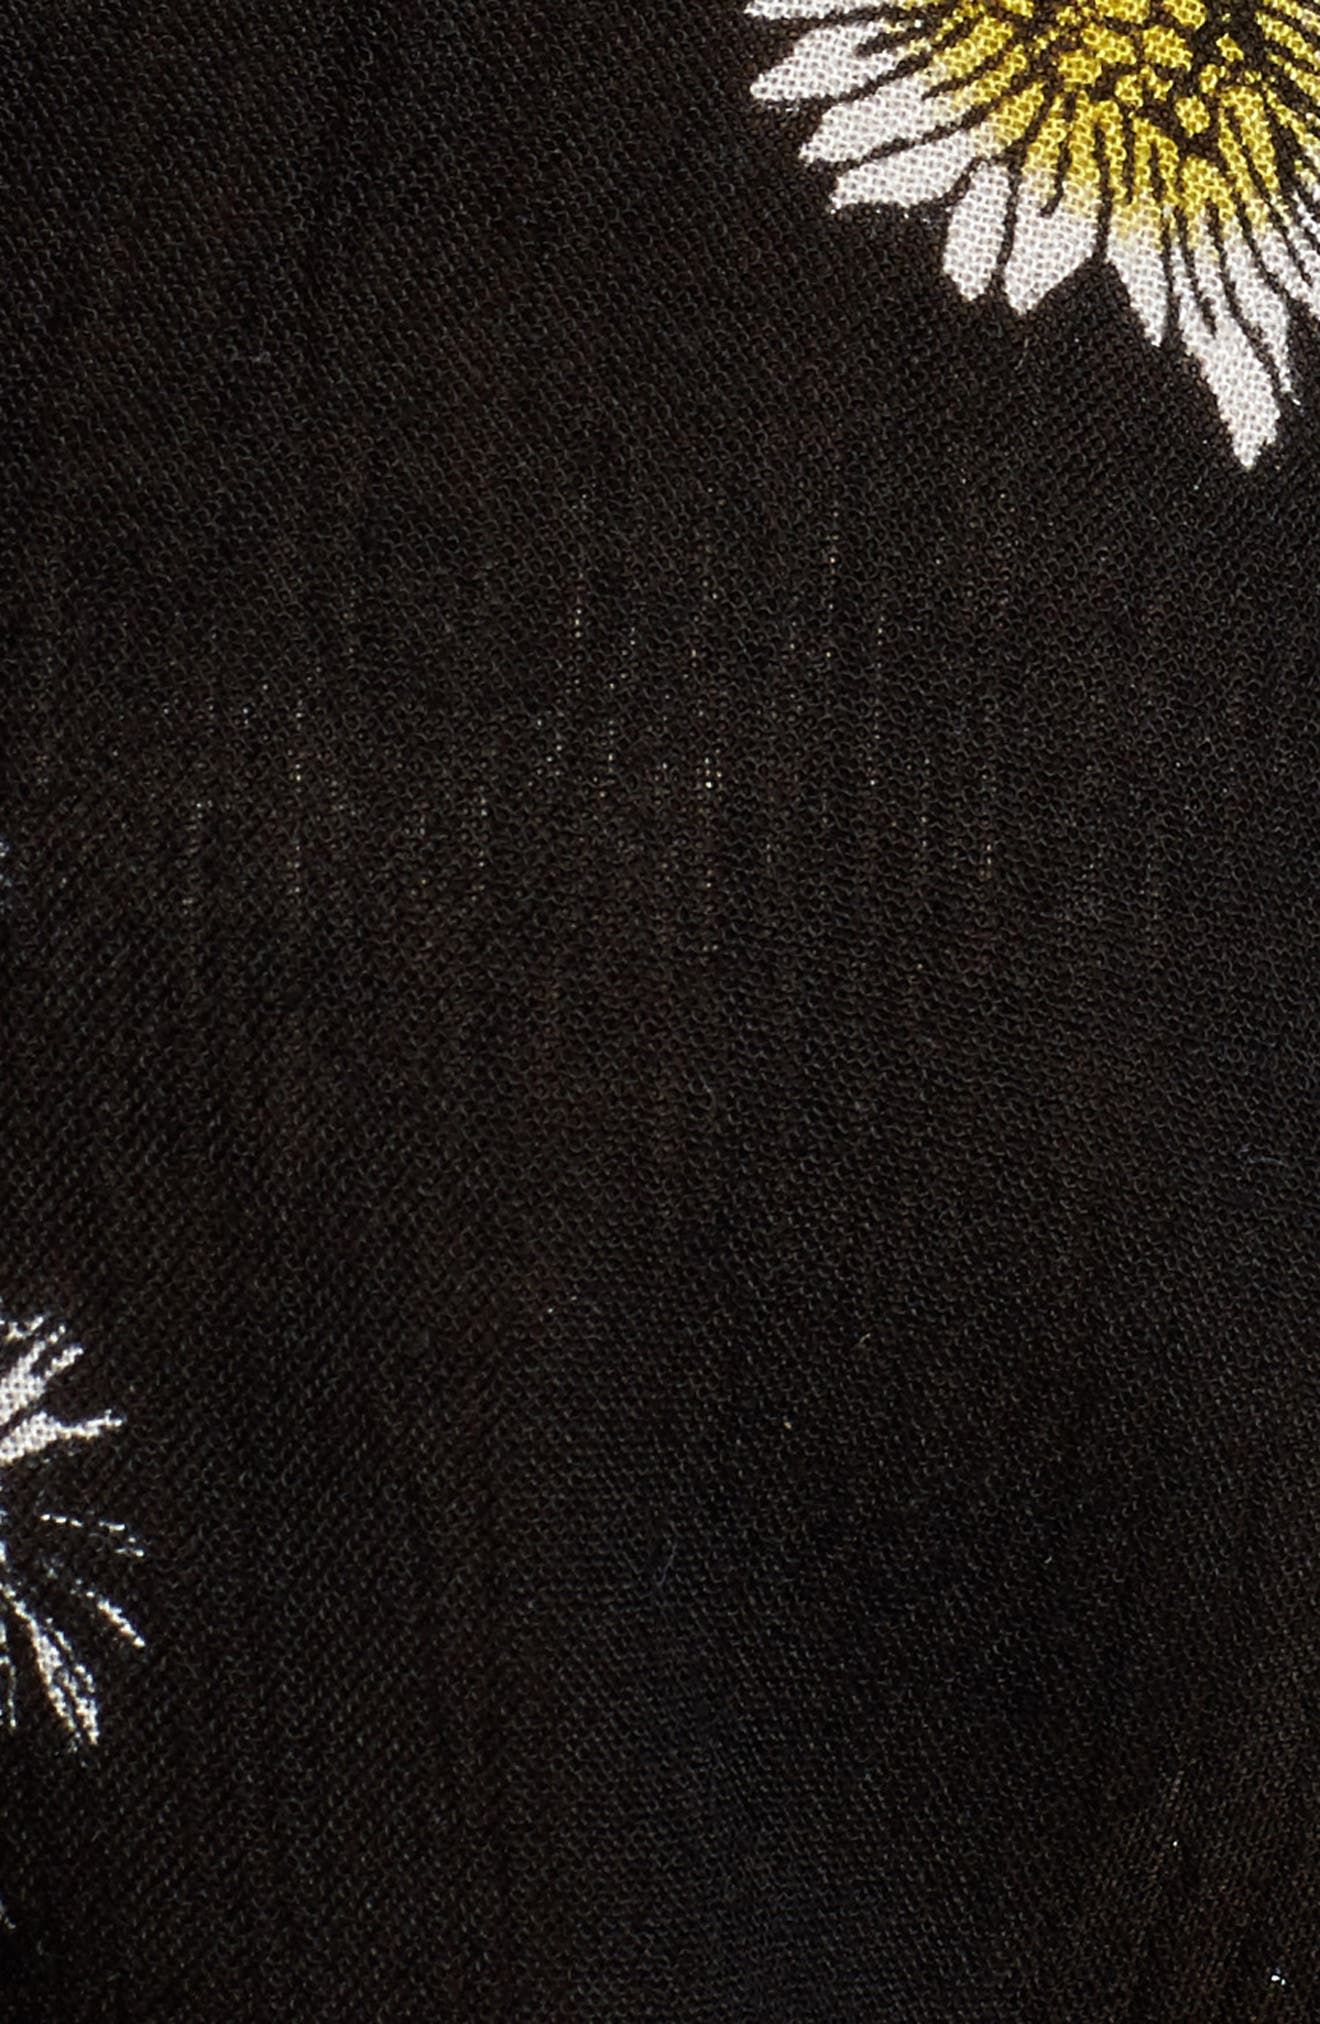 Hattie Crop Top,                             Alternate thumbnail 5, color,                             Black Multi